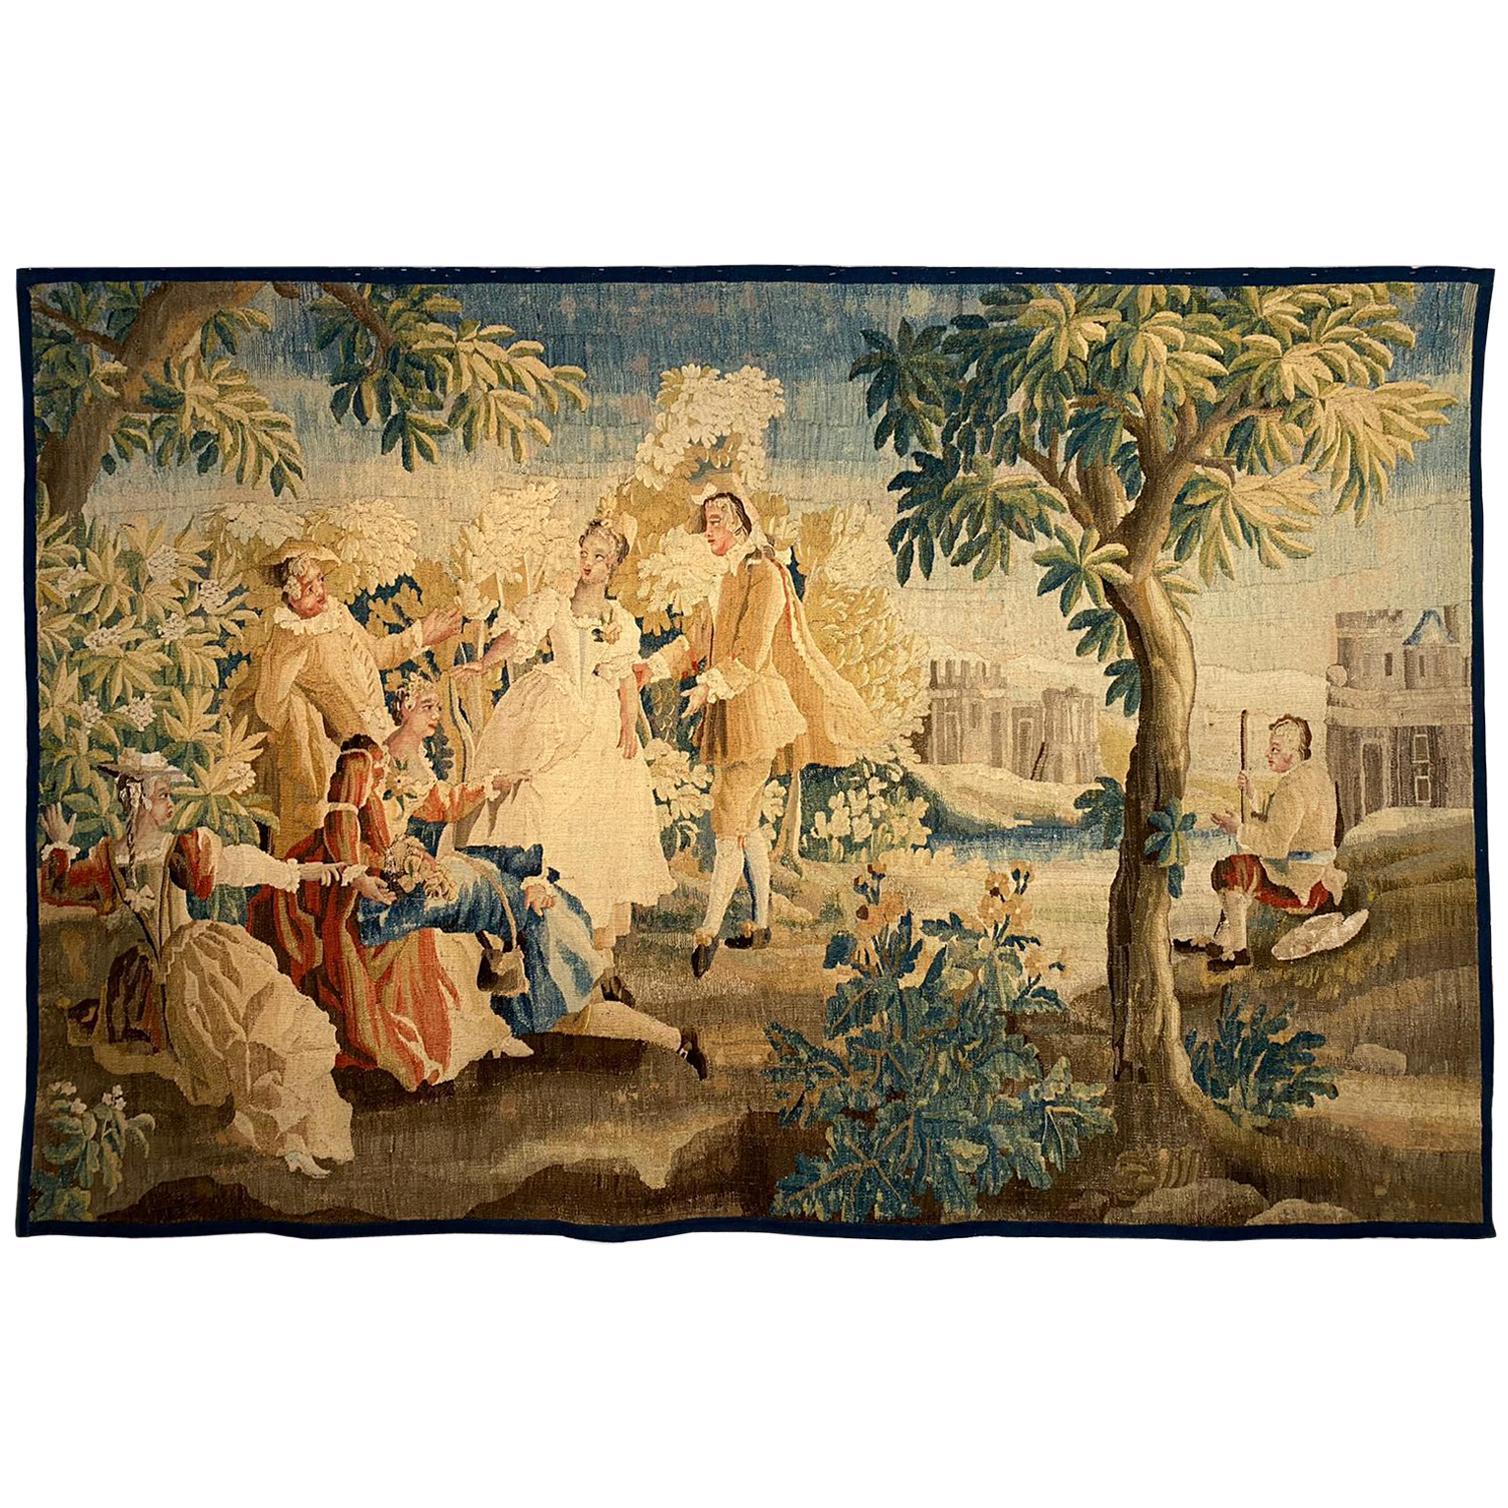 Sublime Aubusson Tapestry 18th Century, Louis XVI Period, Romantic Scene